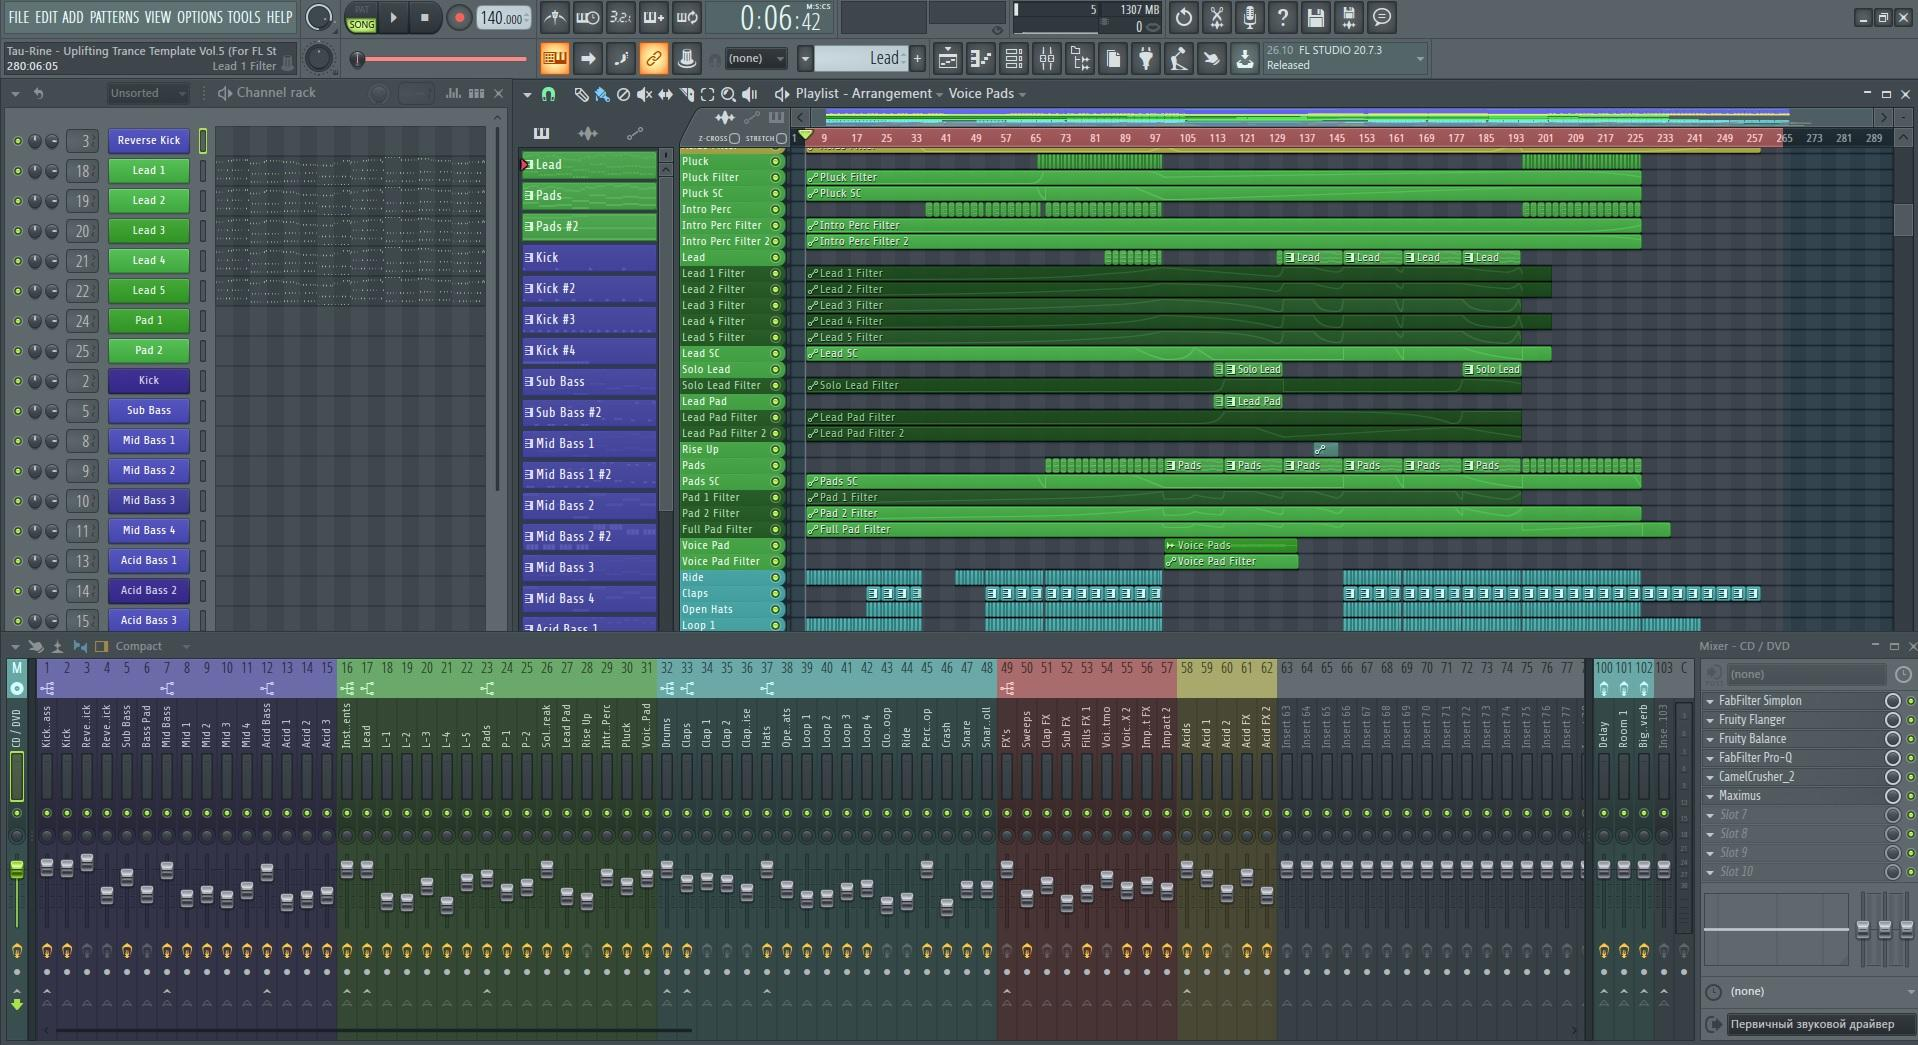 tau-rine-uplifting-trance-template-vol-5-for-fl-studio-screenshot